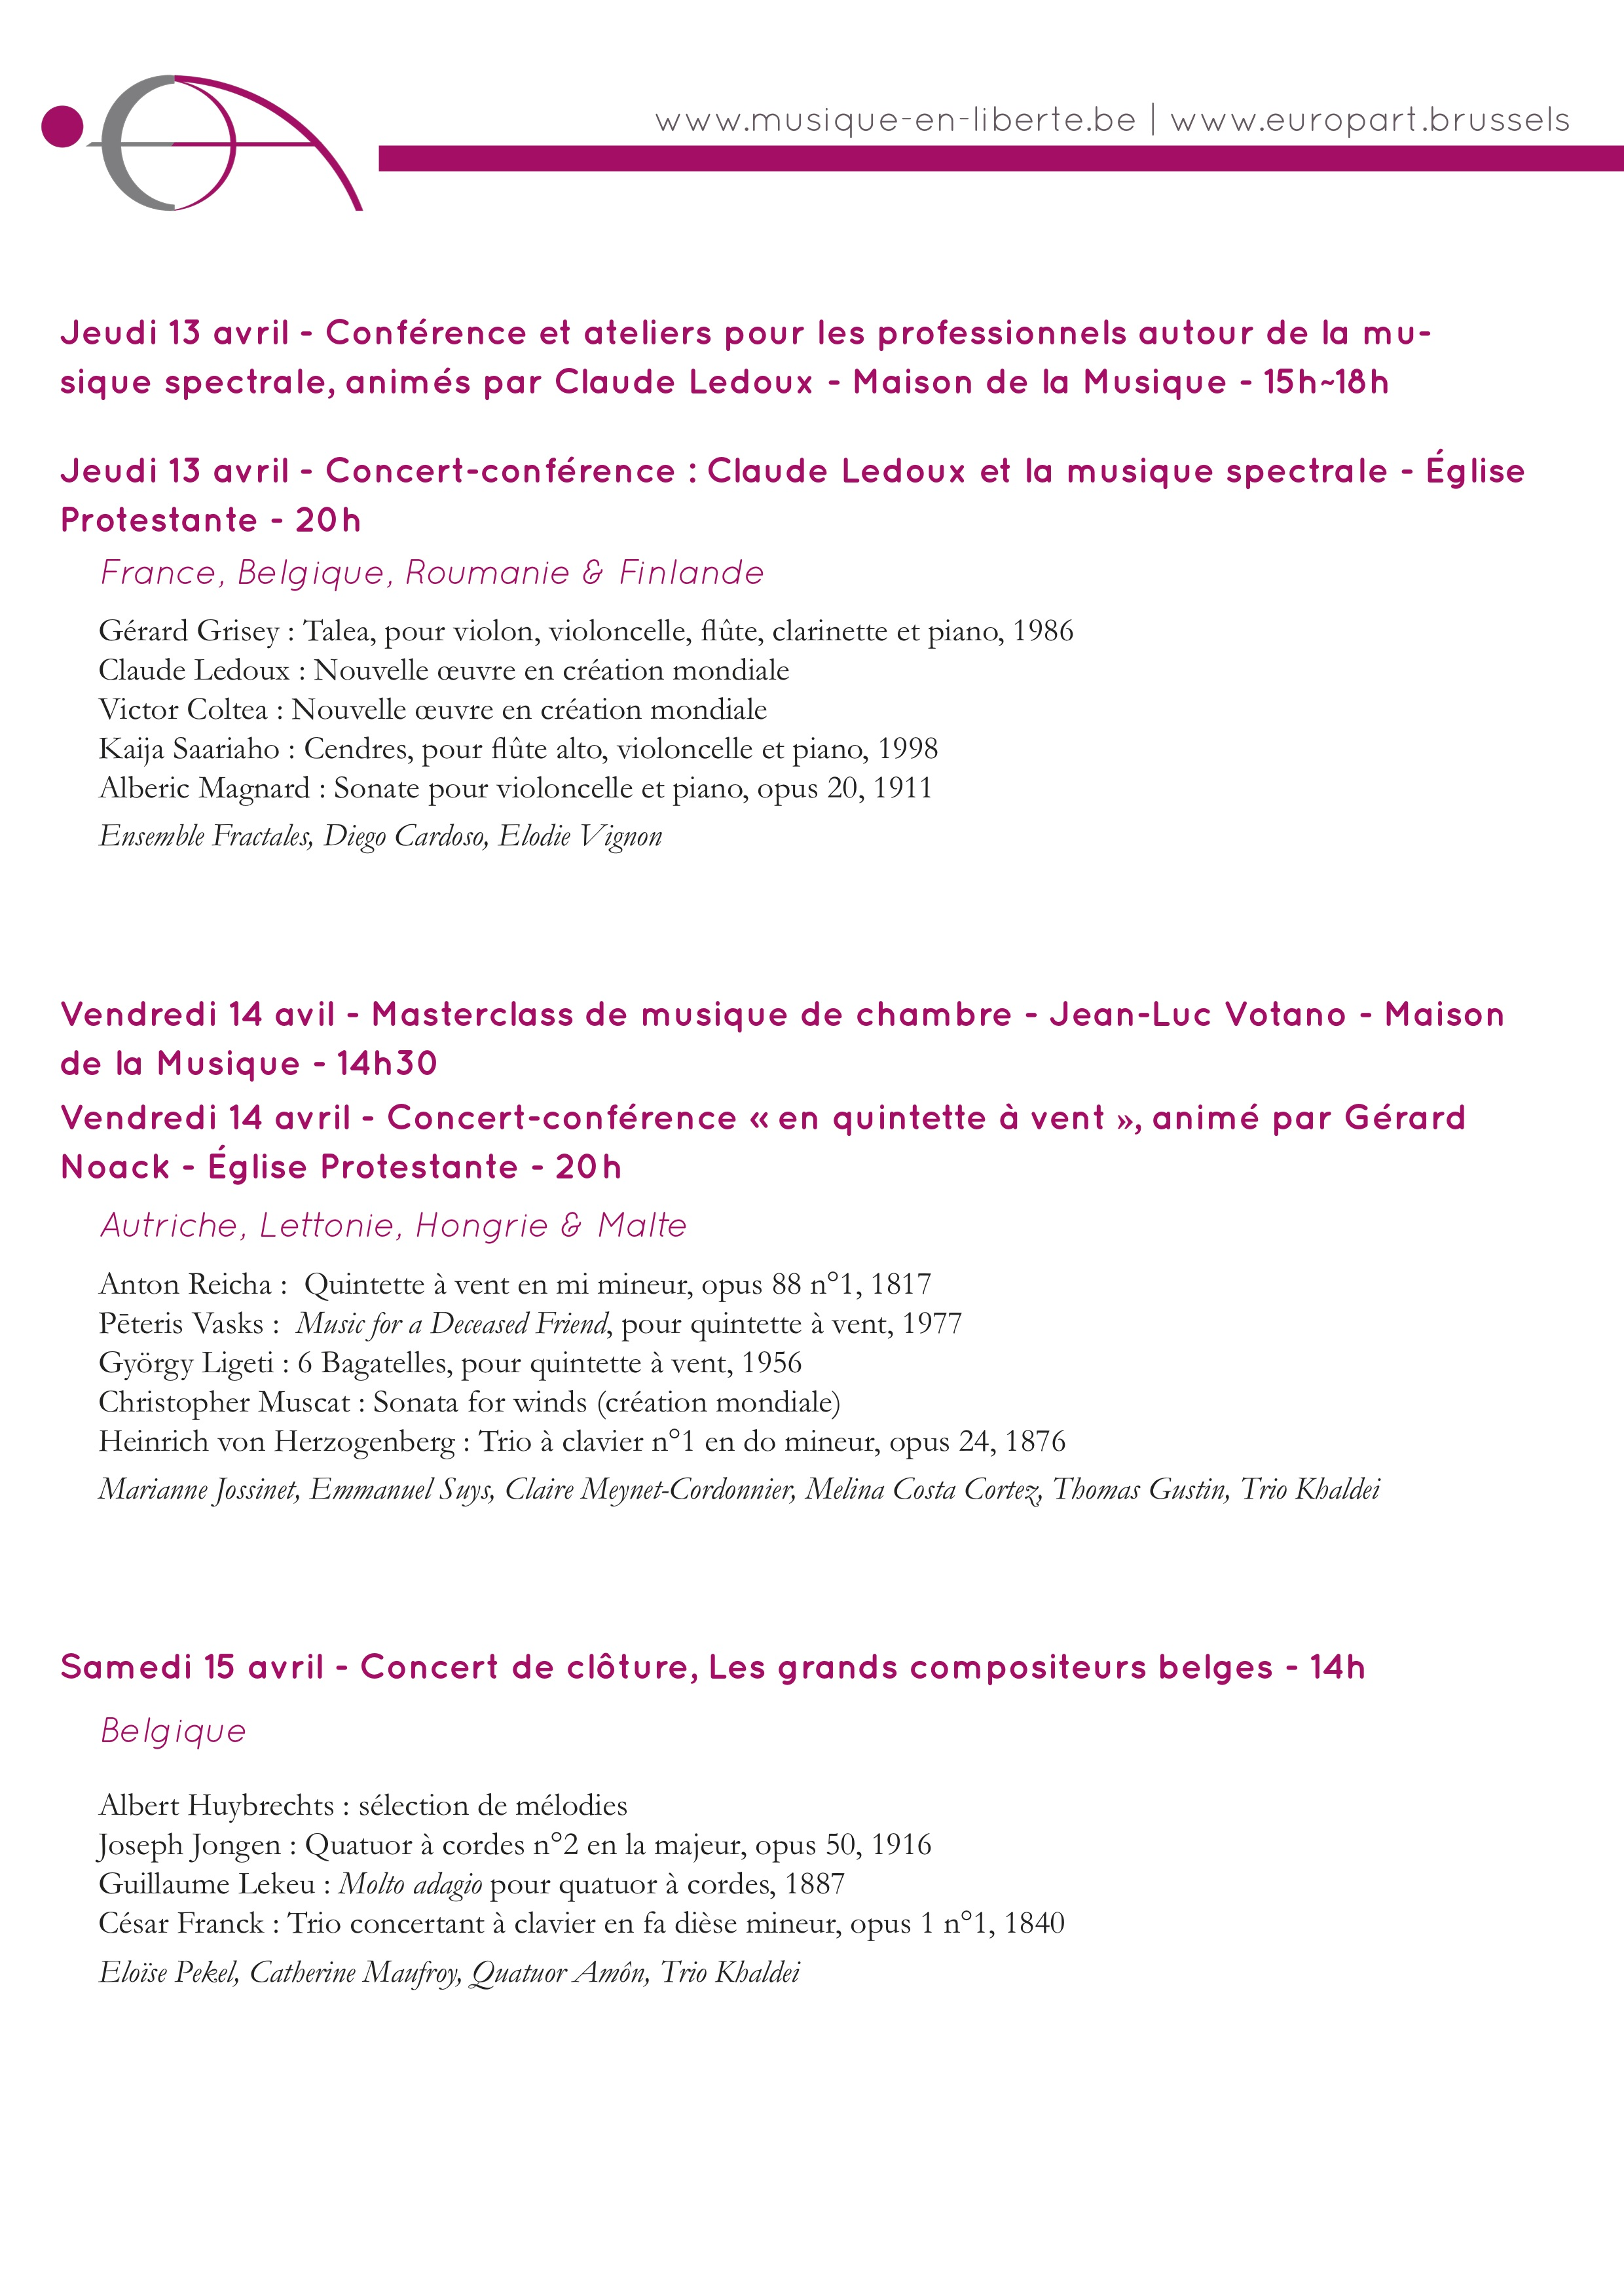 EuropArt_Programme_2017